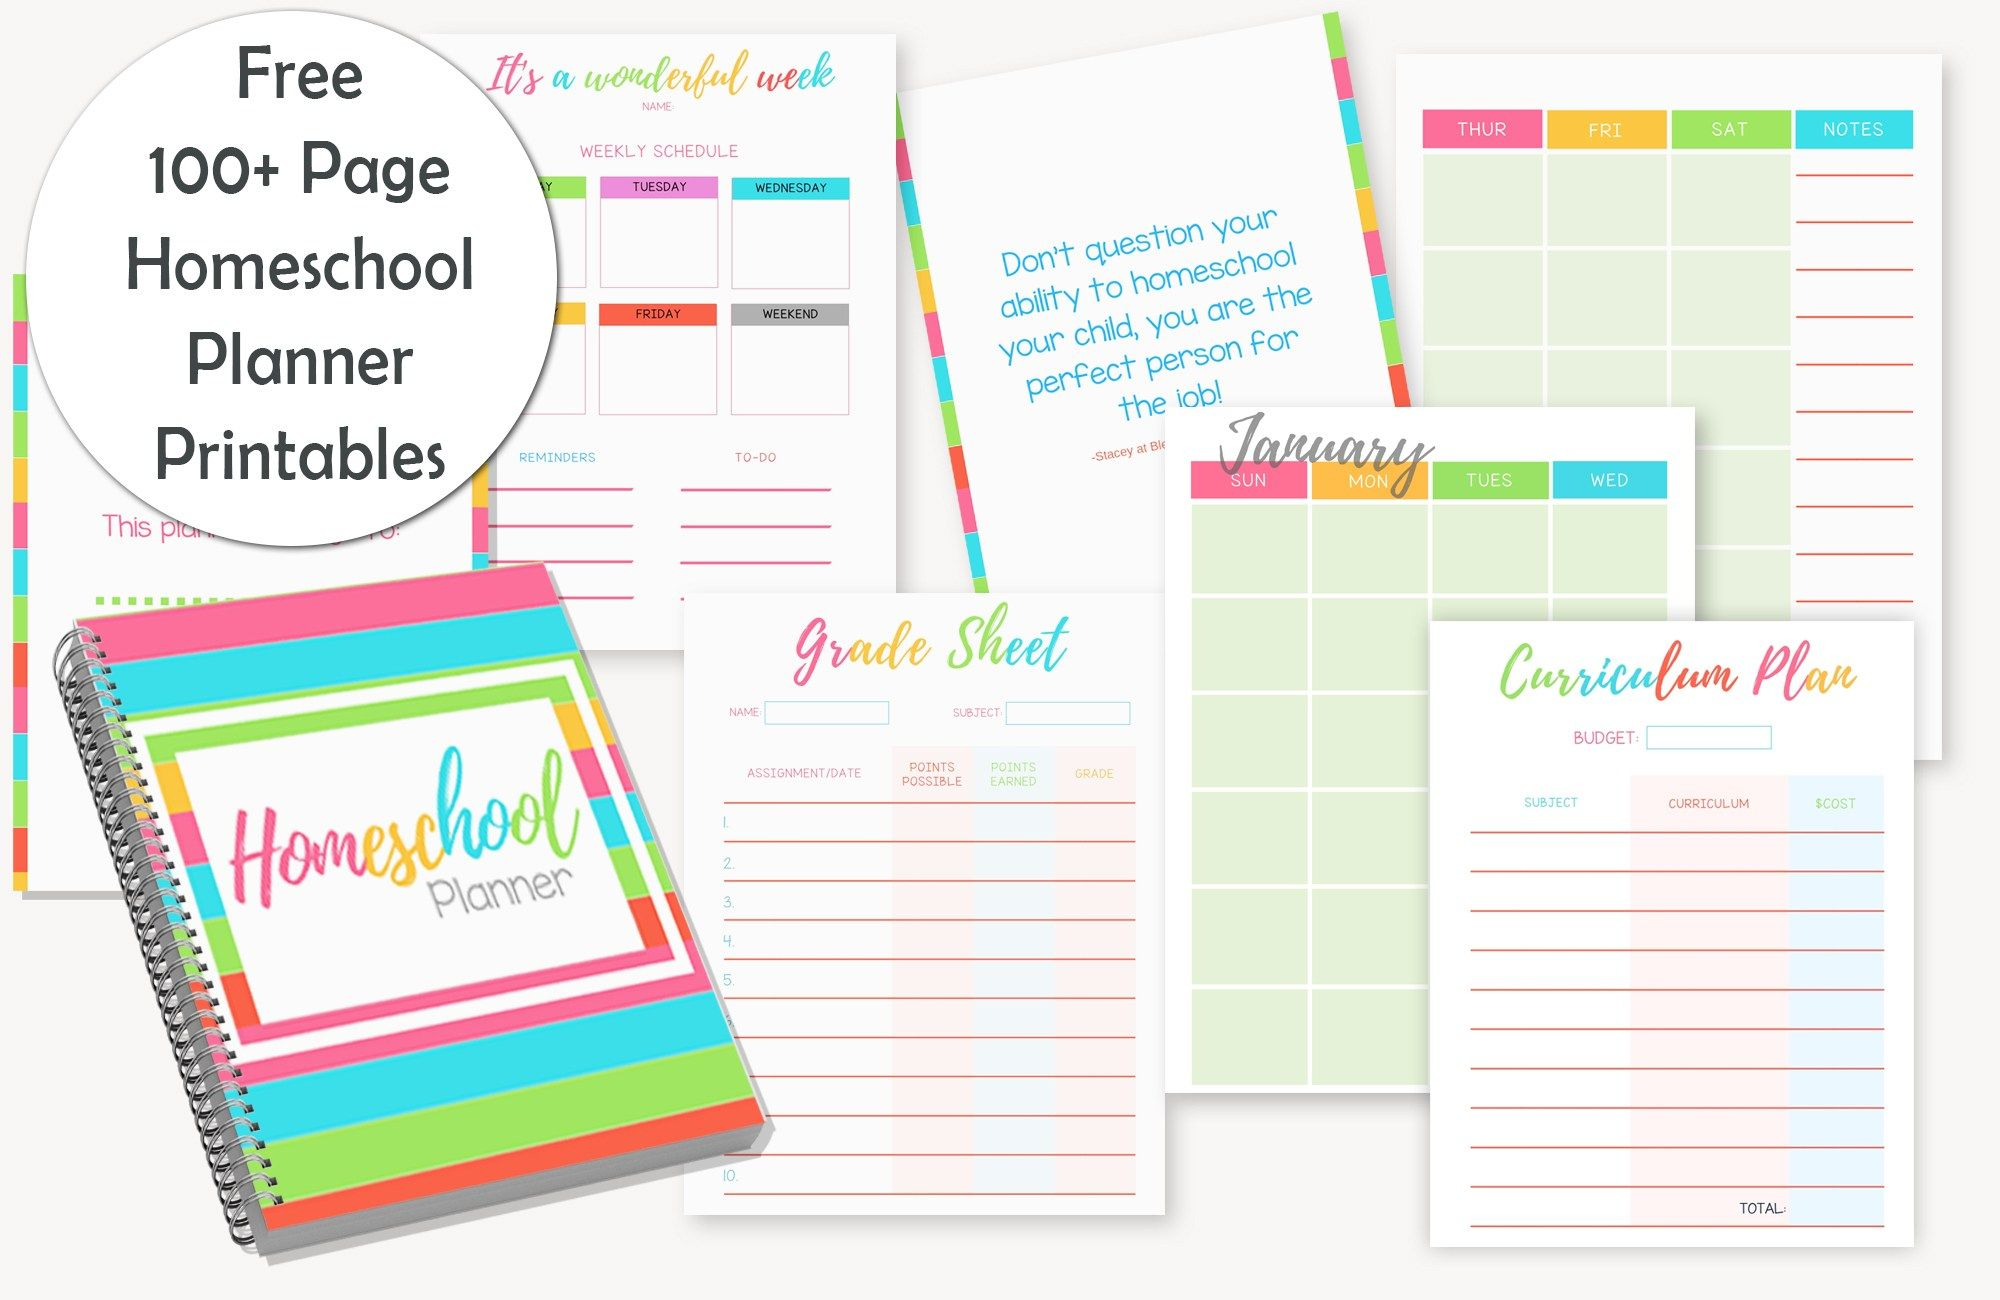 Week At a Glance Form Homework planner, Weekly planner